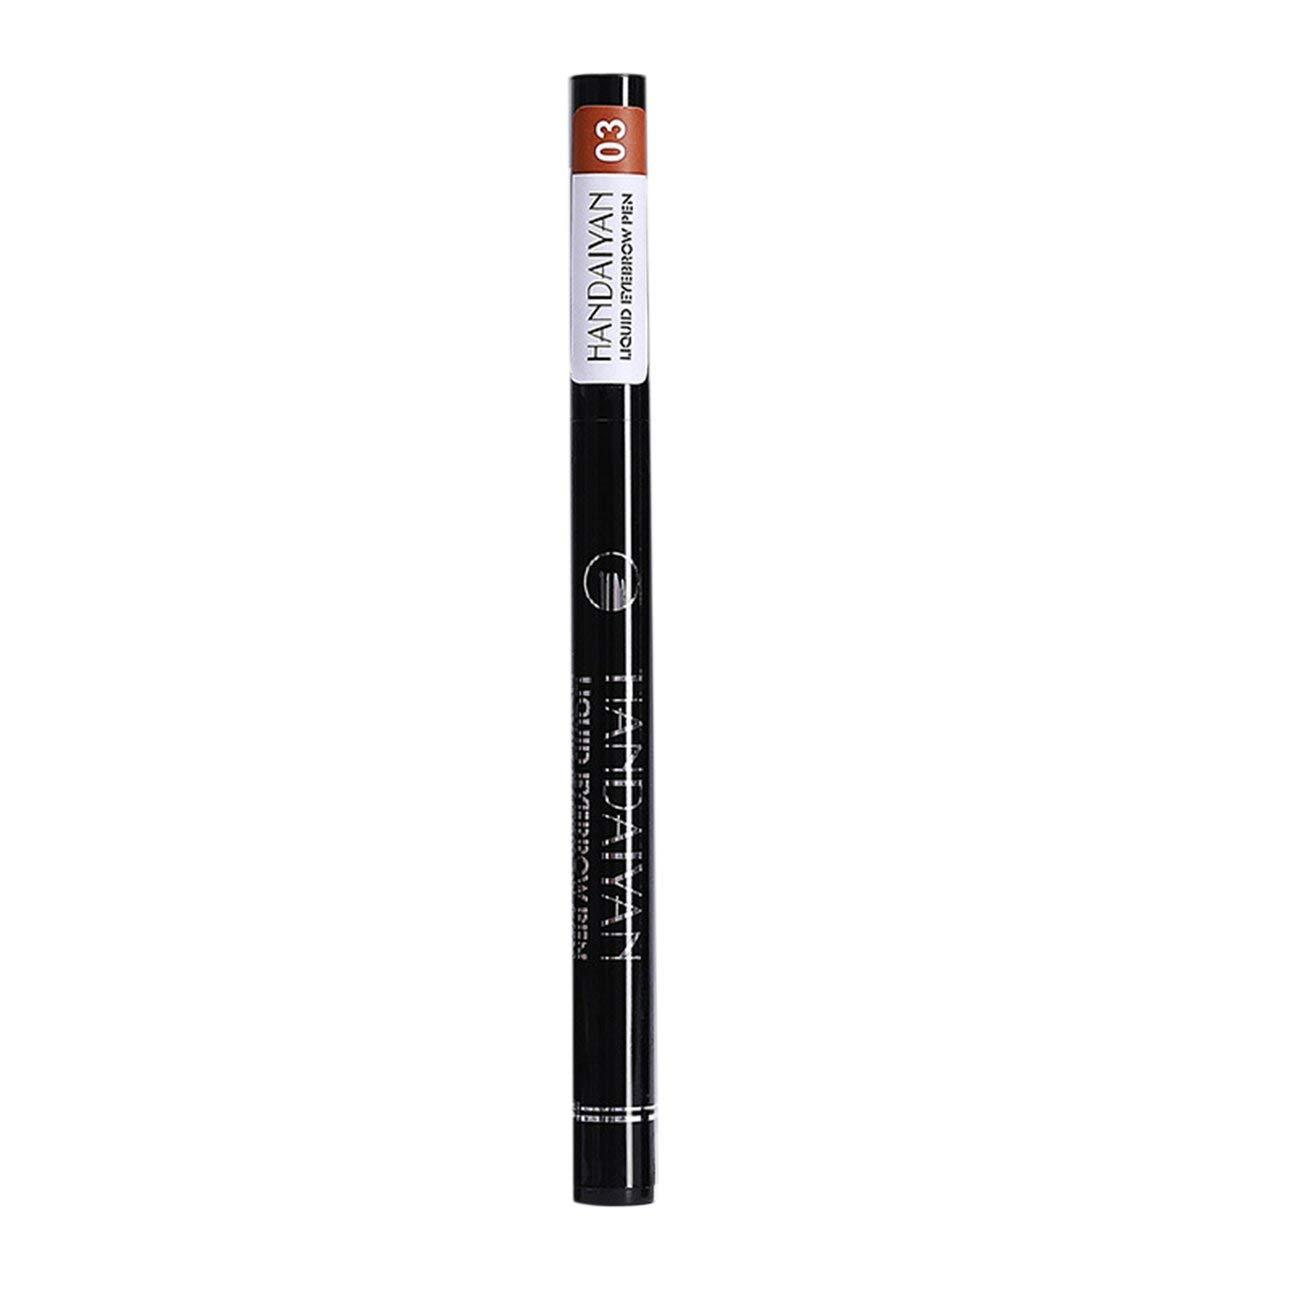 Liobaba Portable 4 Way Tip Liquid Pen Waterproof Eyebrow Pen Non-Fade Long Lasting Eyebrown Makeup Pen Beauty Cosmetic Tool